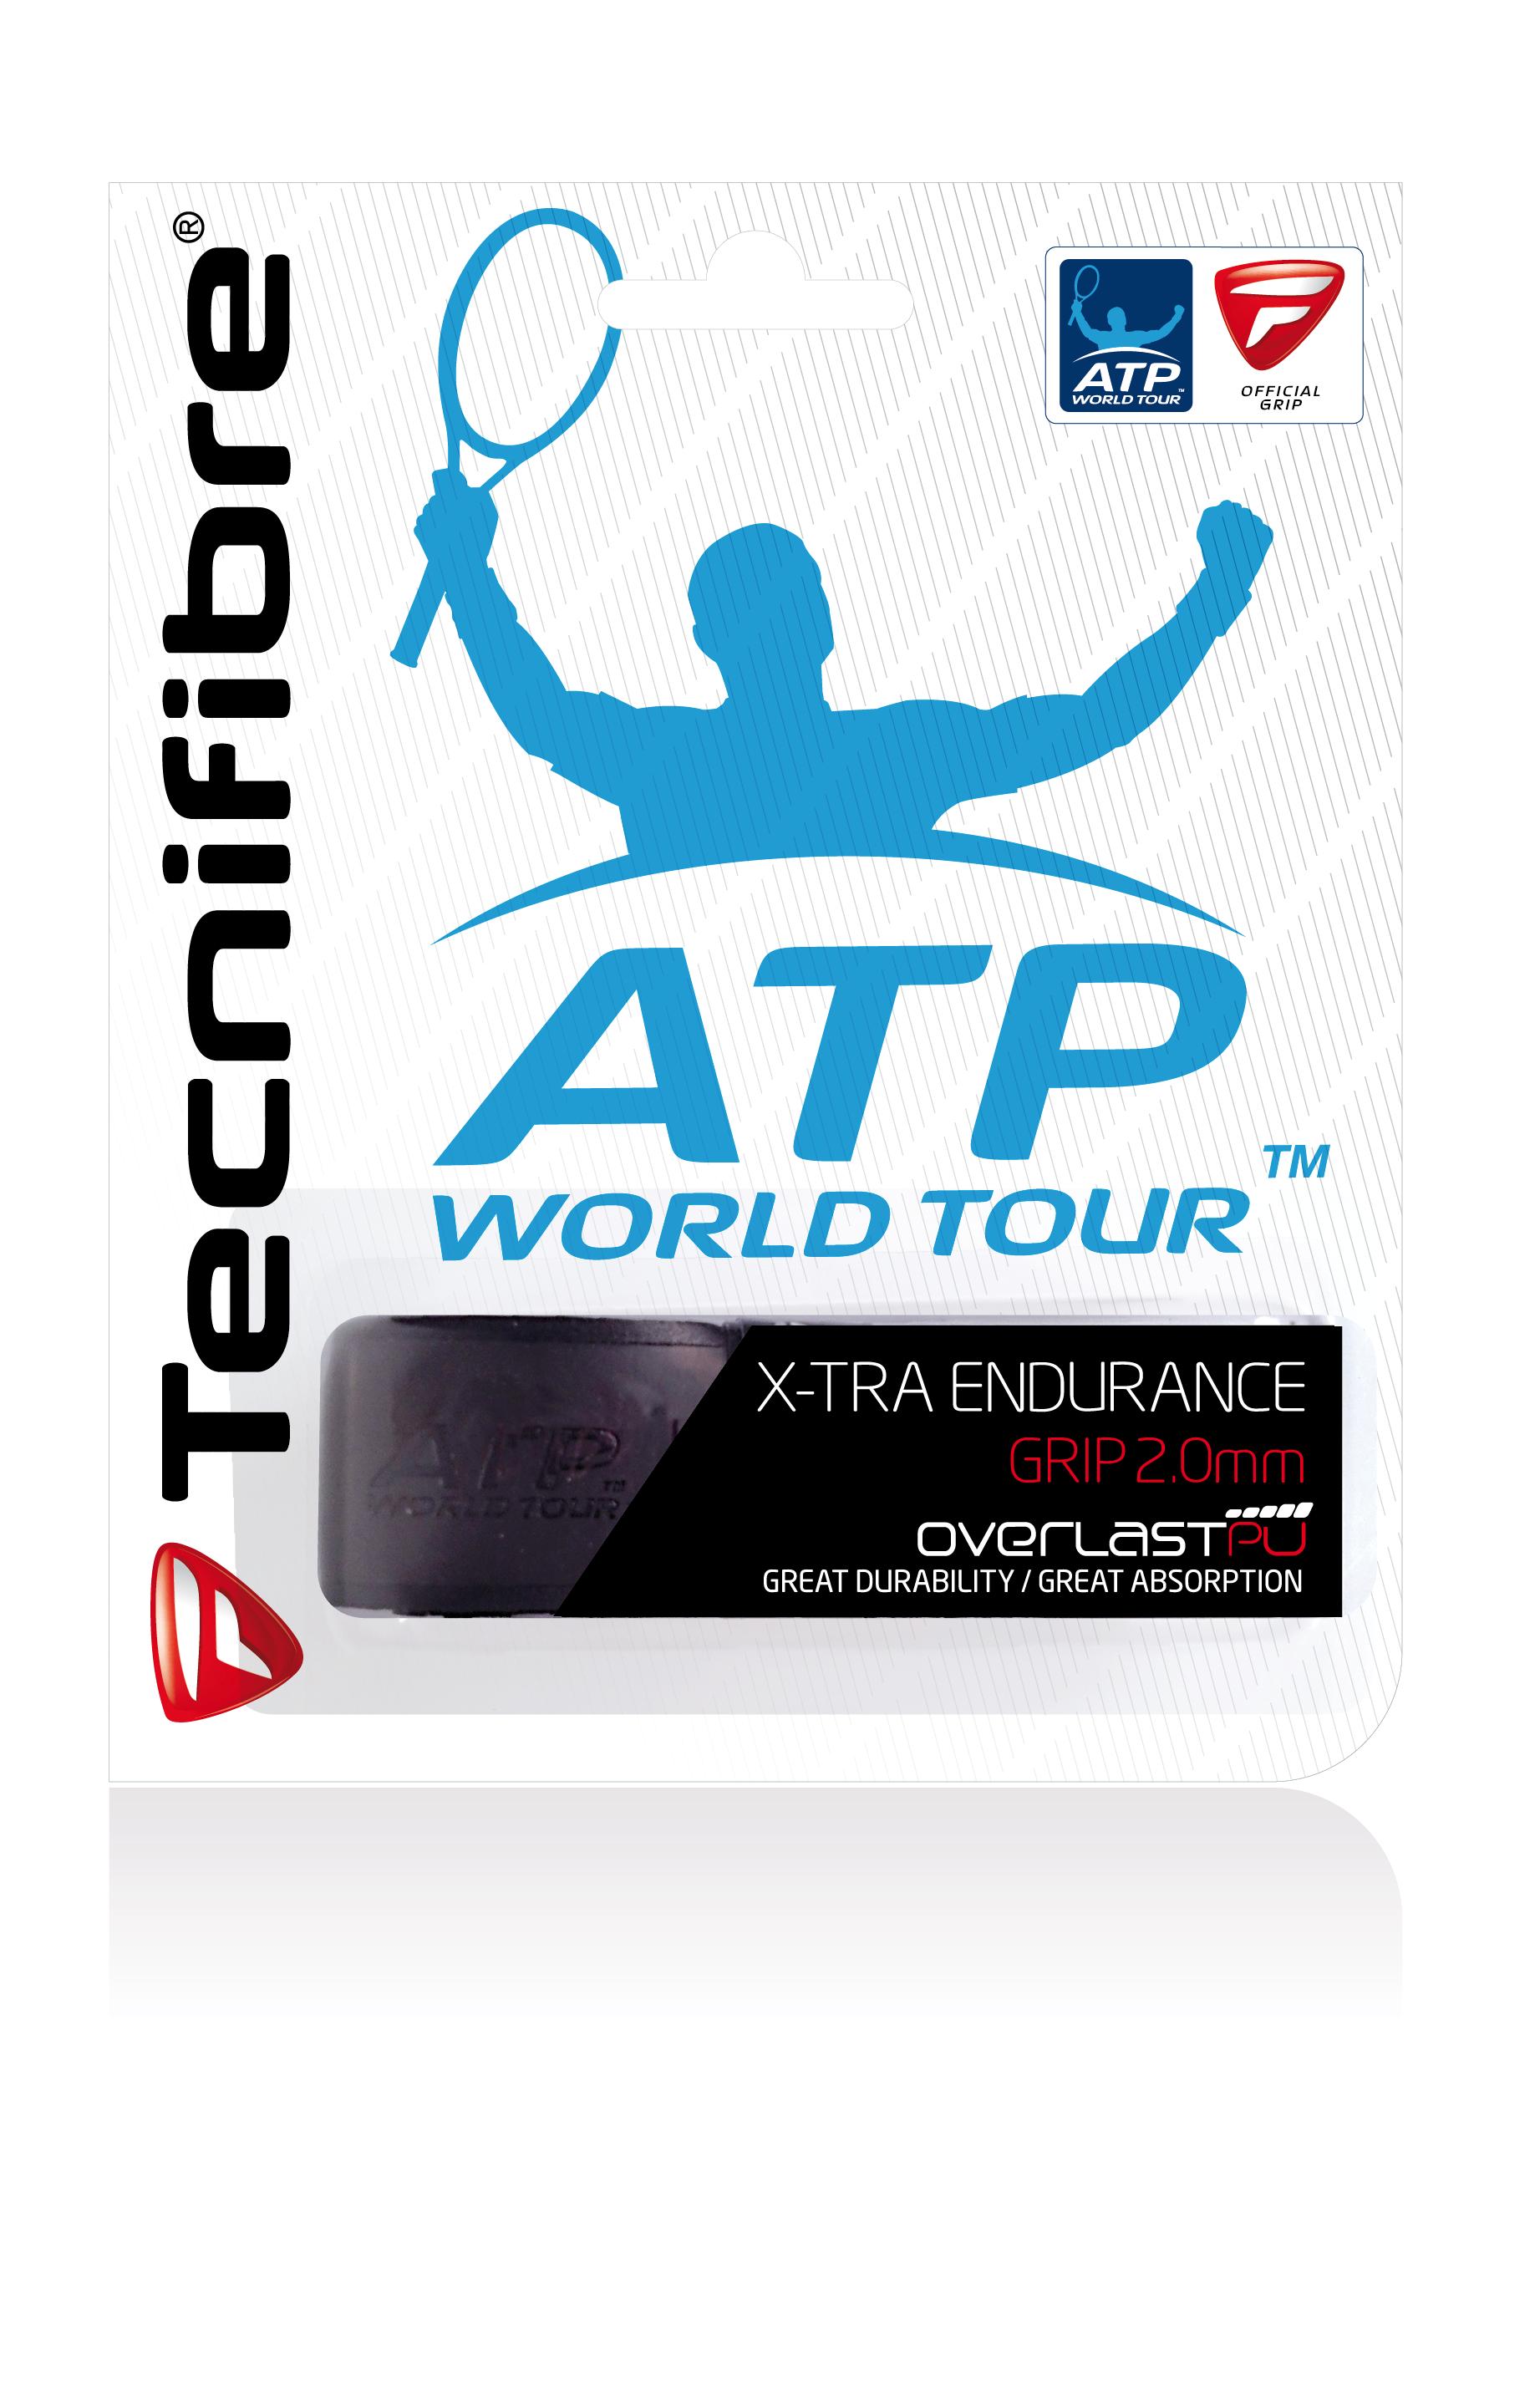 X-Tra Endurance